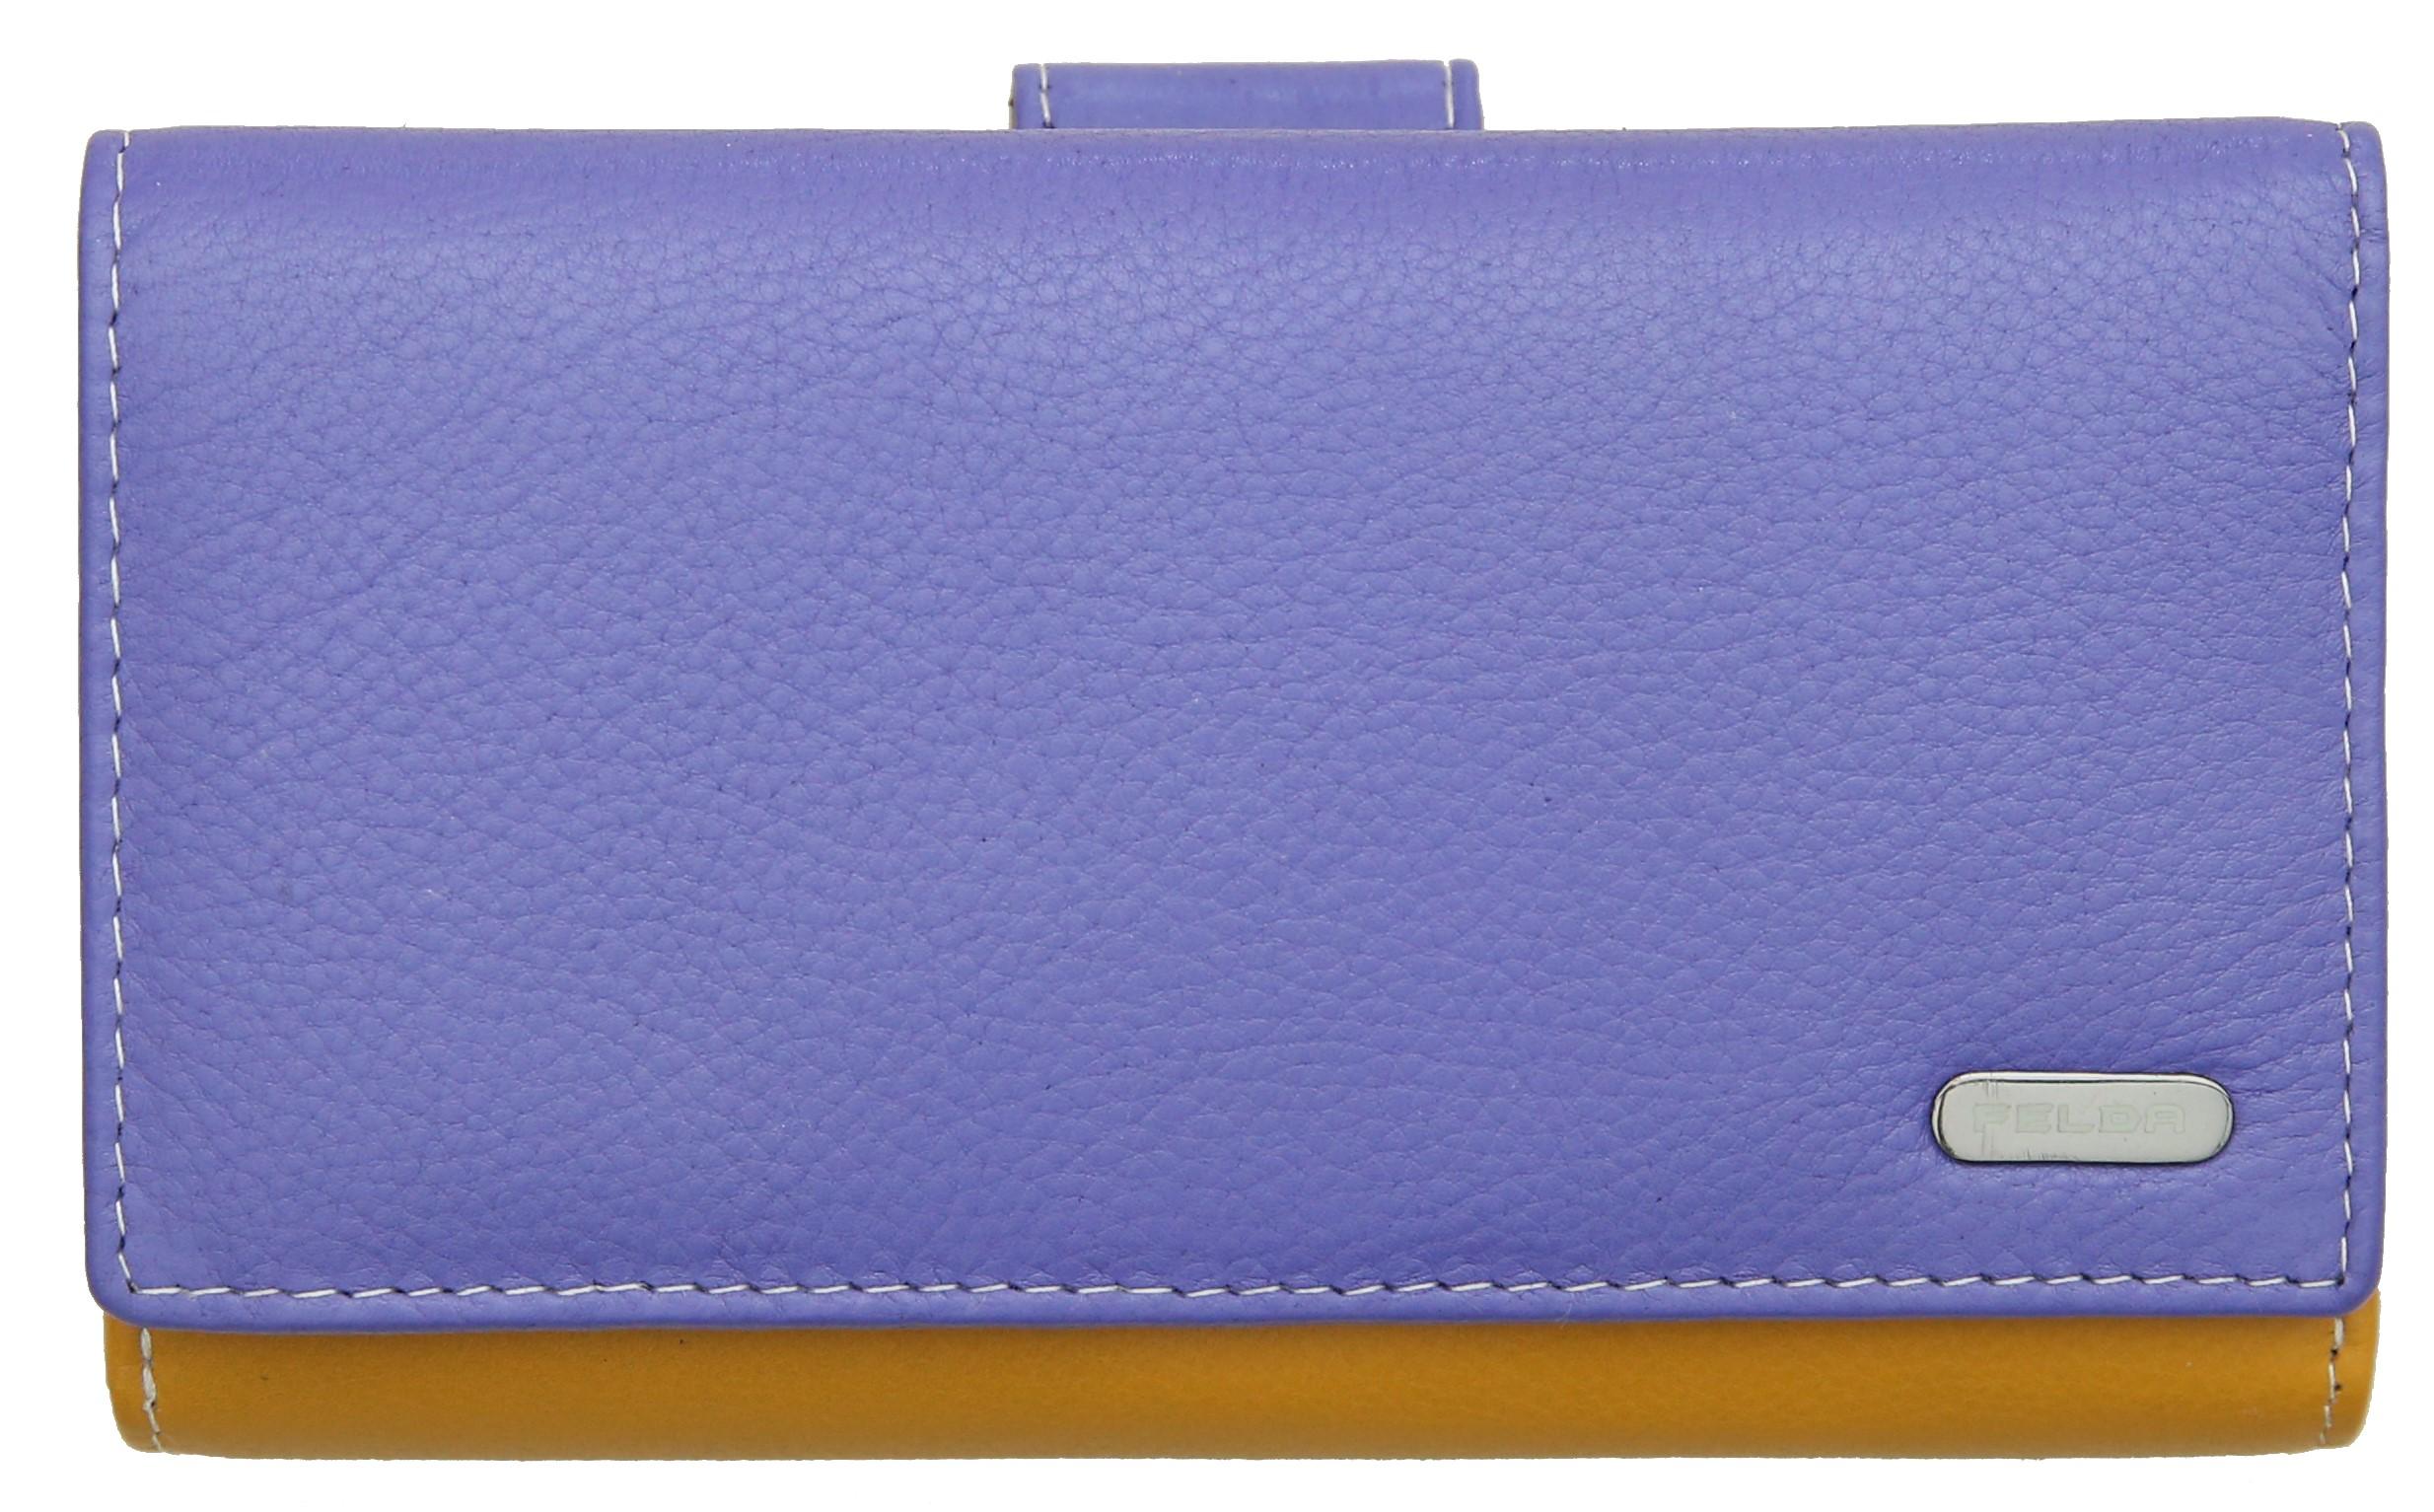 Felda-Portefeuille-pour-cartes-de-credit-cuir-souple-plusieurs-coloris miniature 32